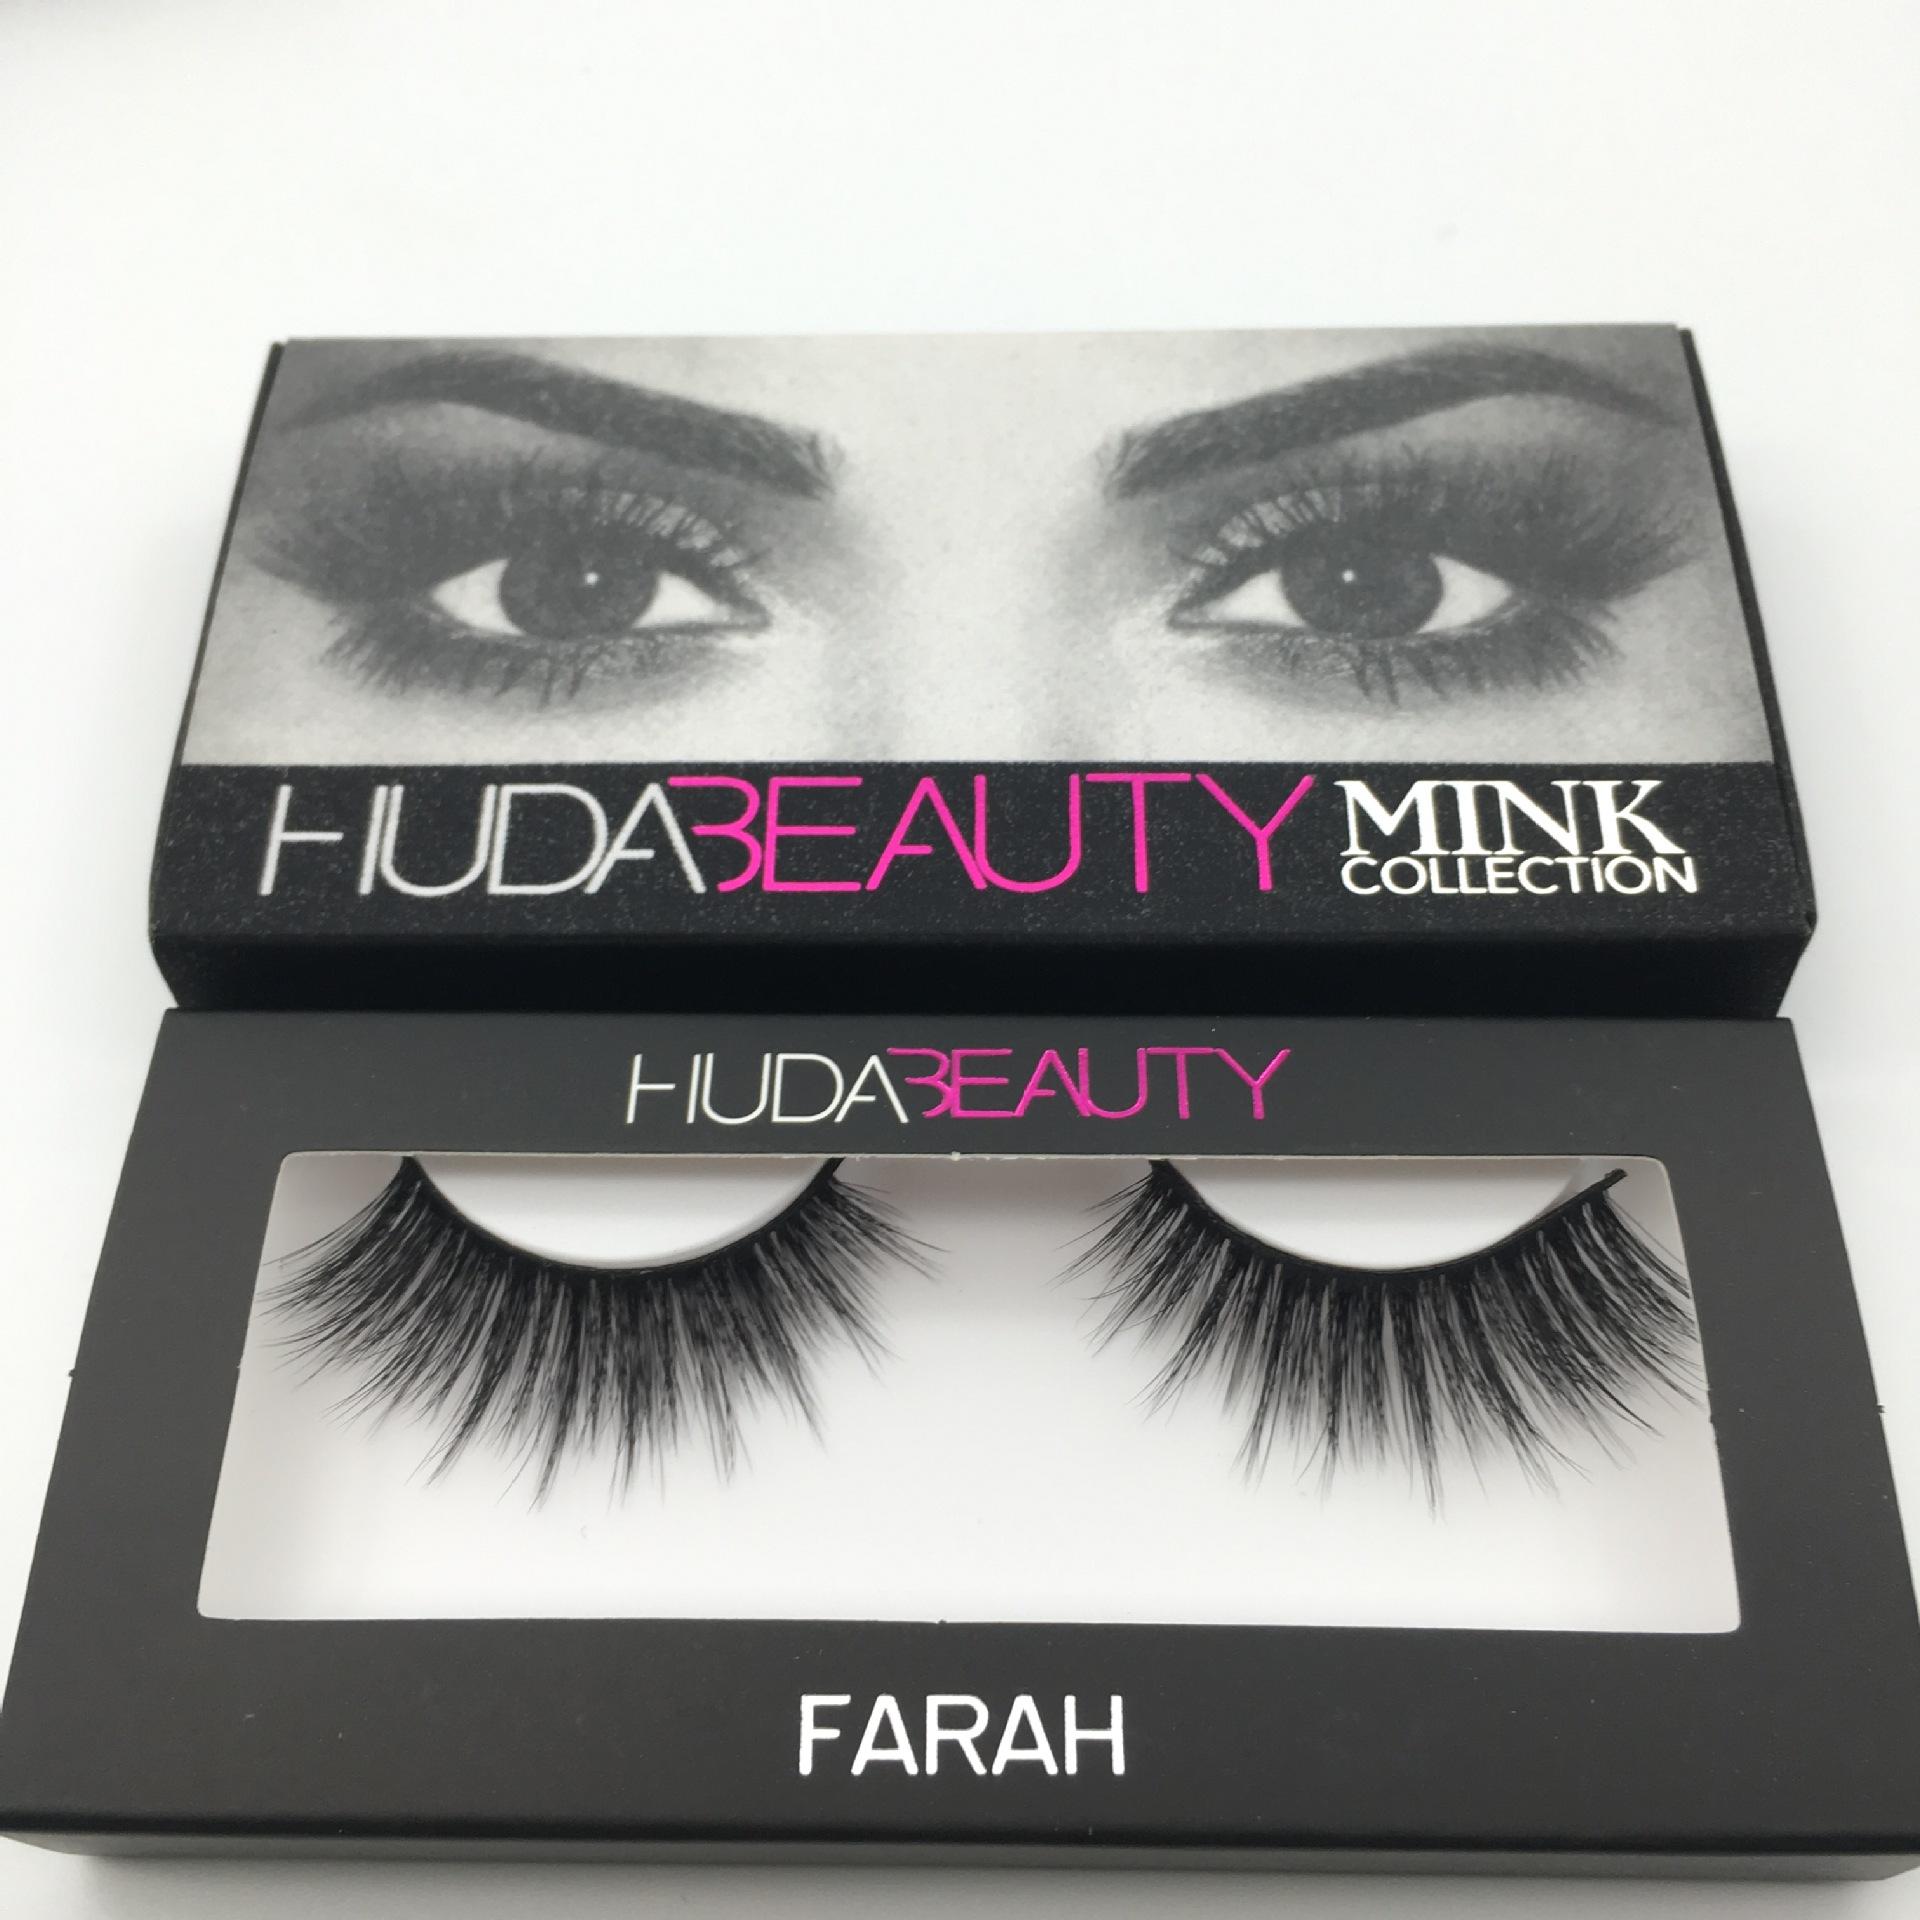 ca781116be3 False Eyelashe Type:Full Strip Lashes False Eyelashes Style:Thick Size:3D  False Eyelash Craft:Hand Made False Eyelashe Length:1cm-1.5cm